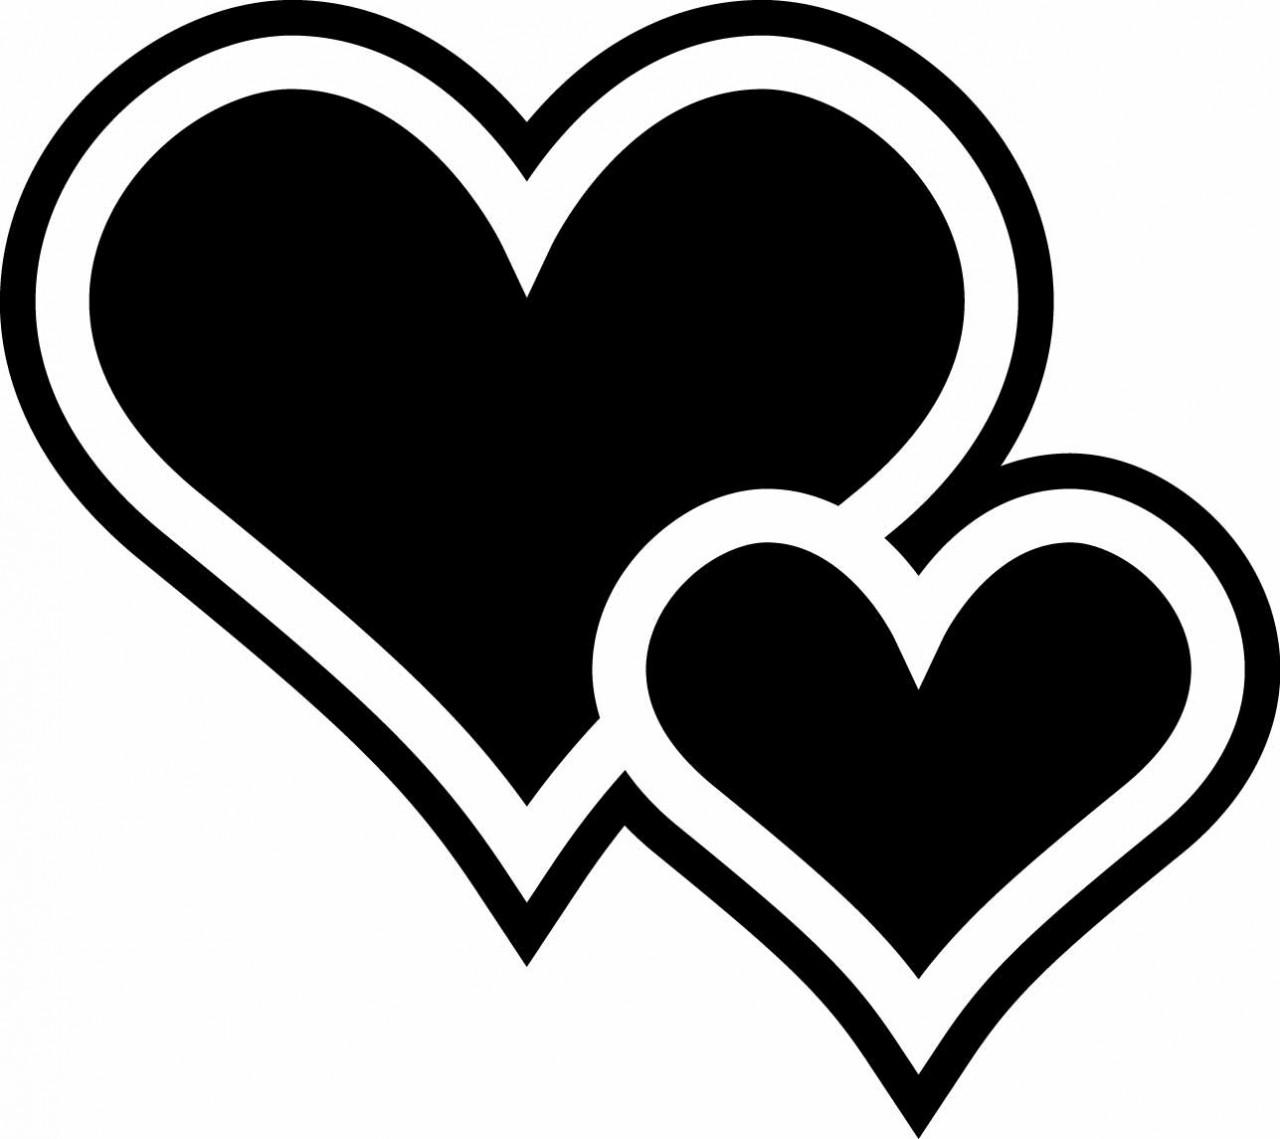 Two hearts clip art